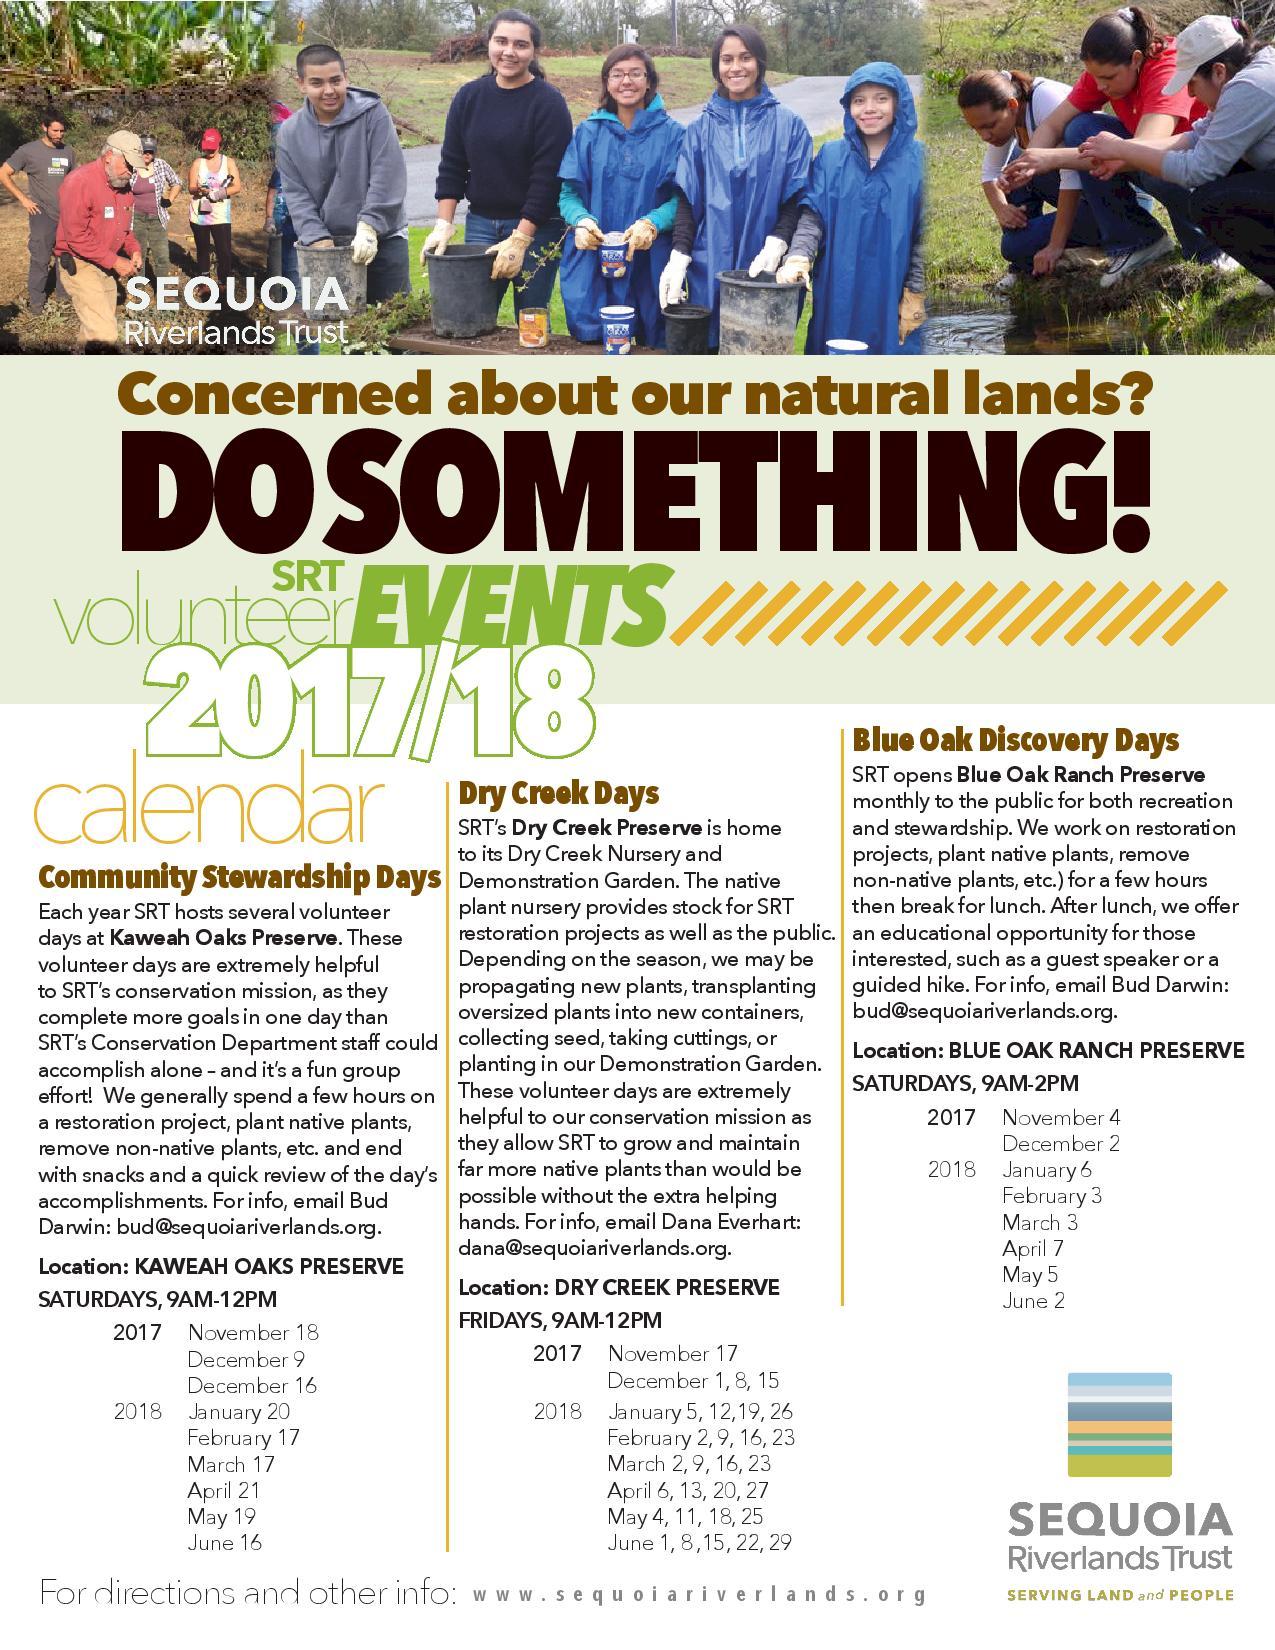 Kaweah Oaks Preserve Stewardship Day